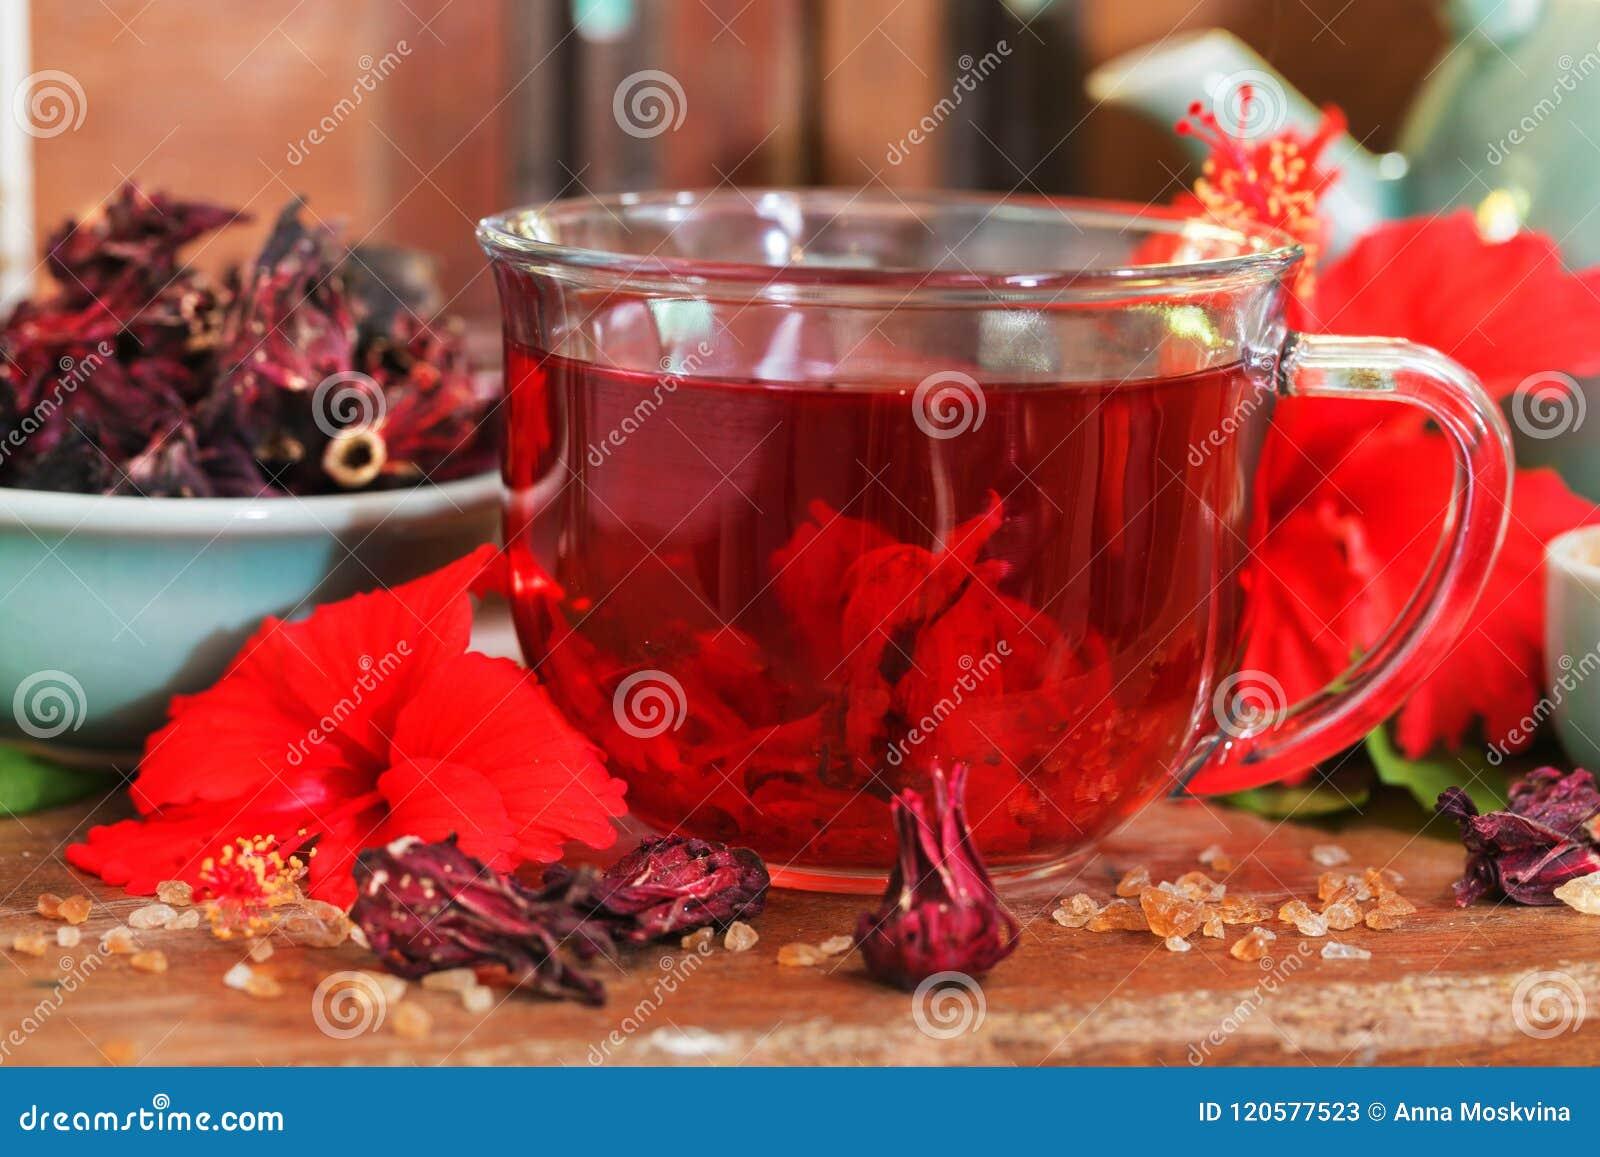 Red Karkade Hibiscus Red Sorrel Tea In Glass Mug With Dry Tea Cu